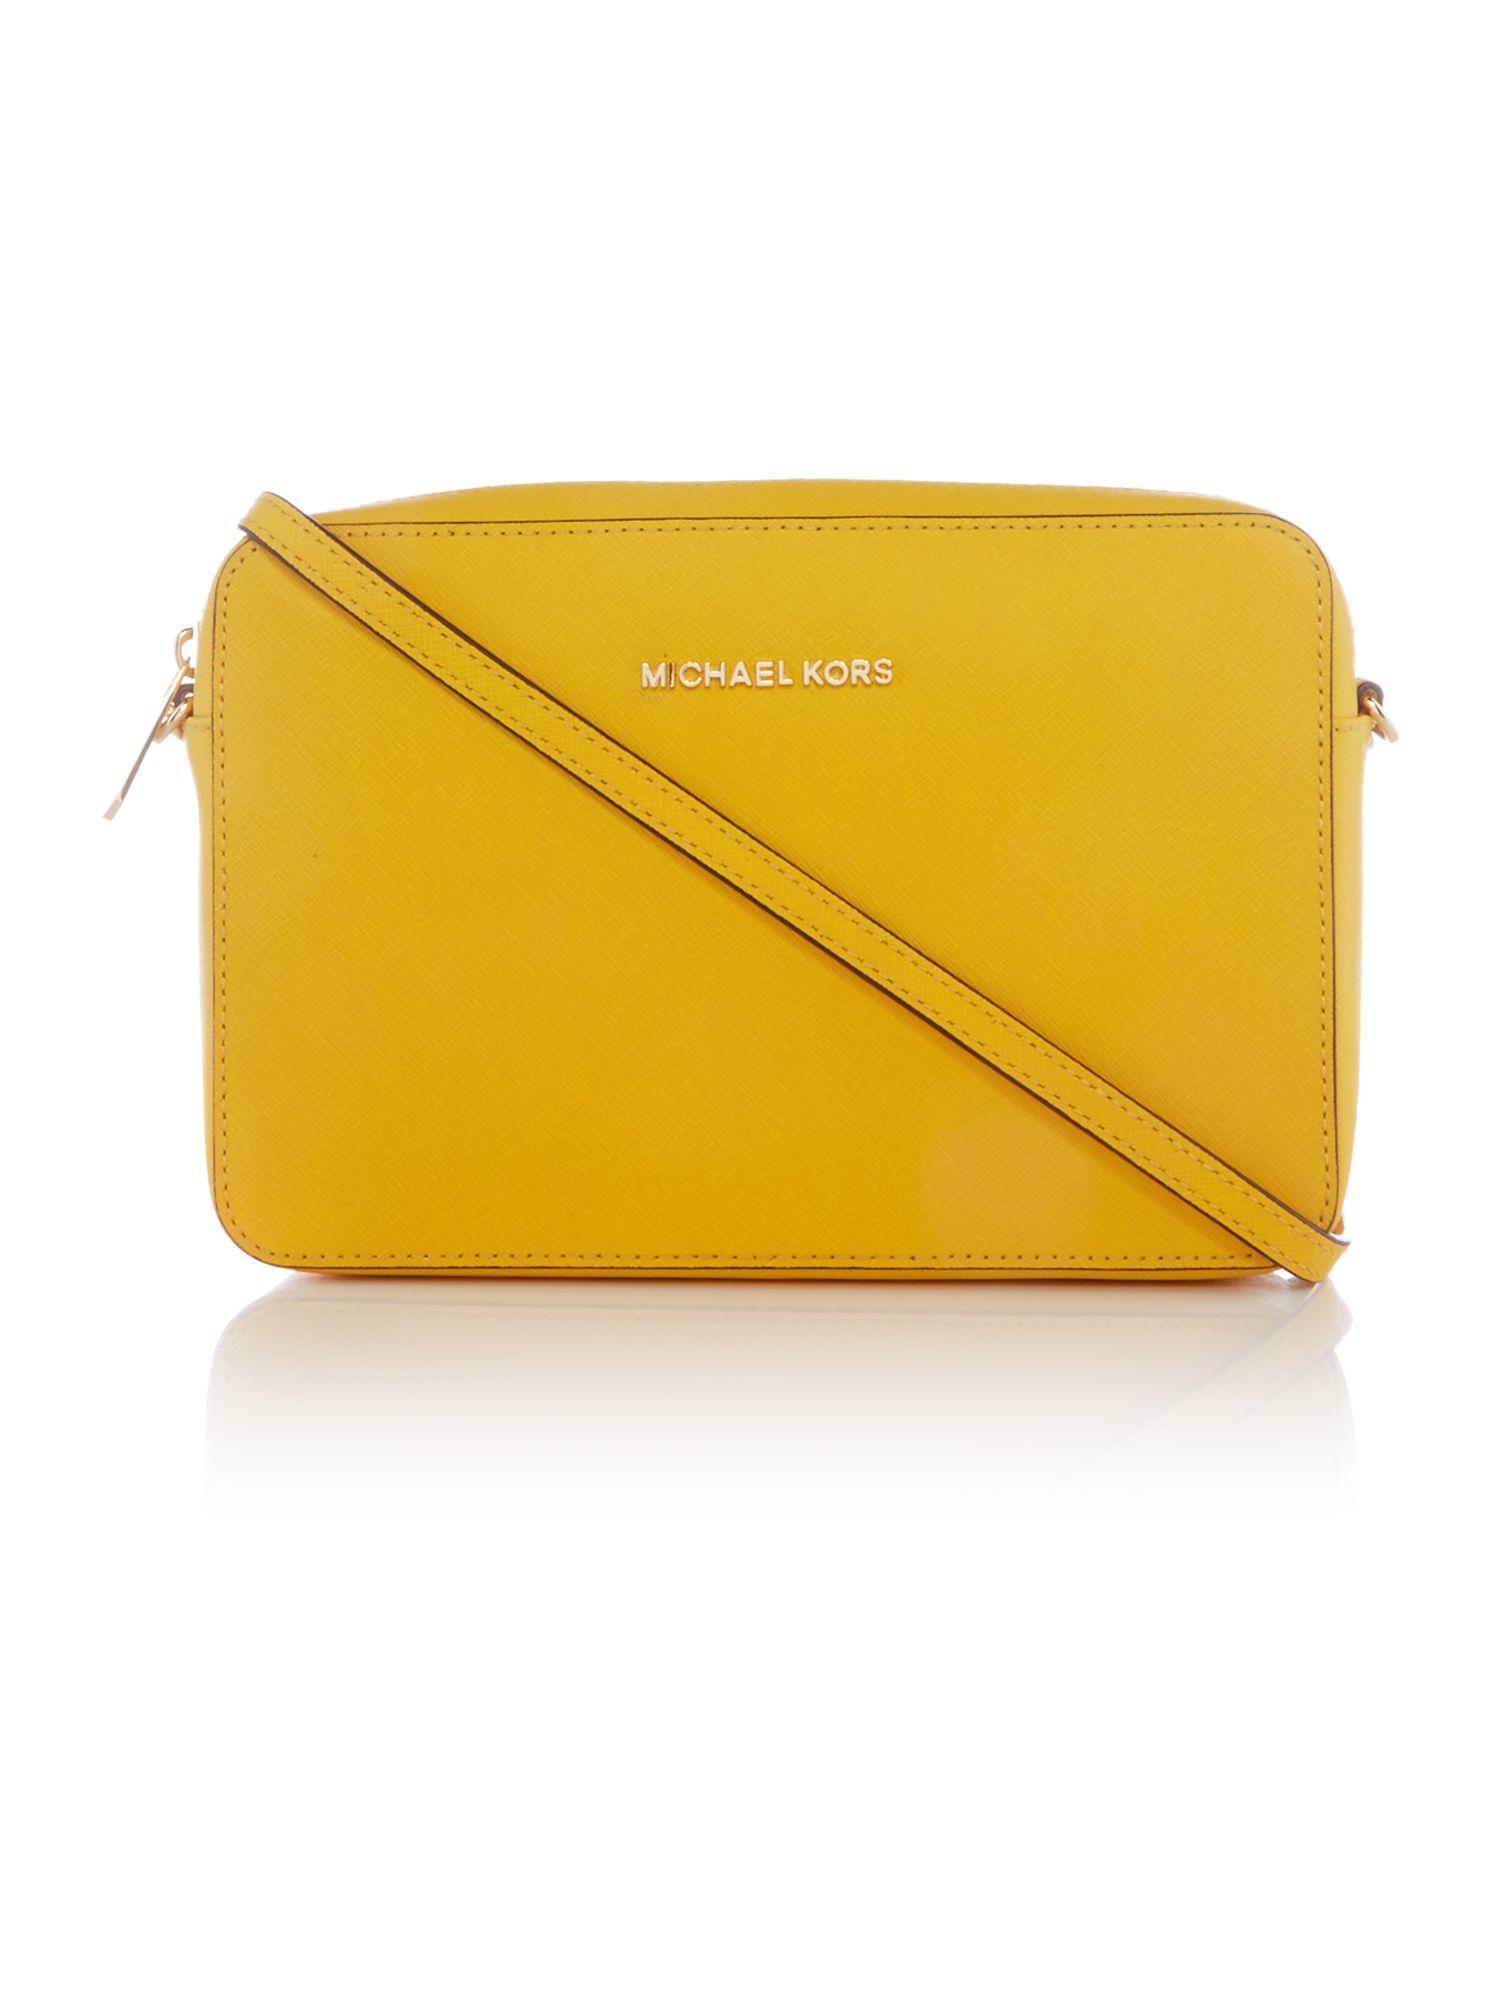 michael kors jetset travel yellow crossbody bag in yellow